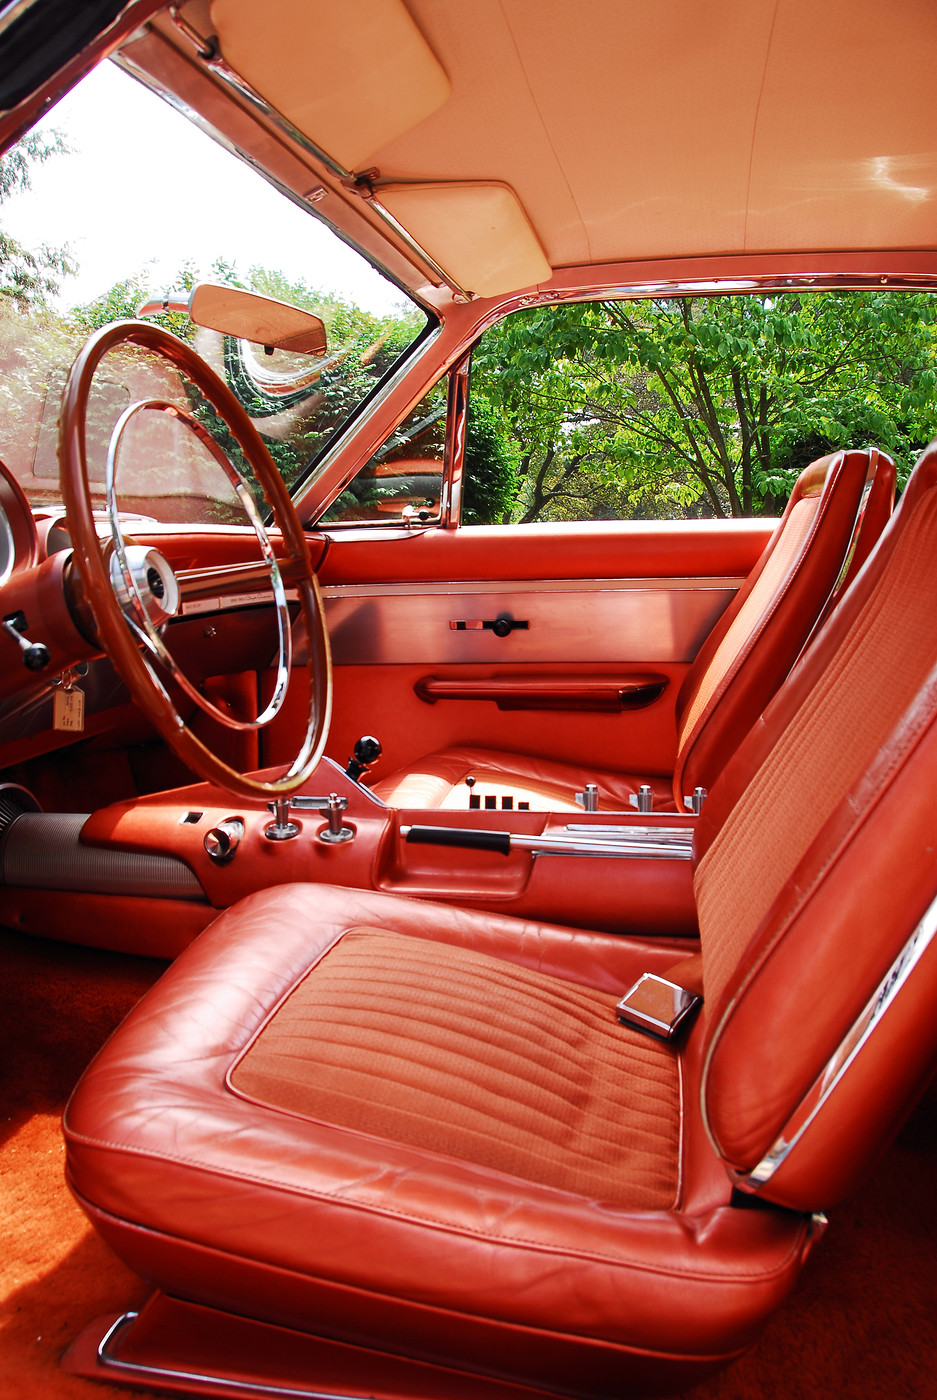 21 1963 Chrysler Ghia Turbine Car vertical front interior bucket seat detail view